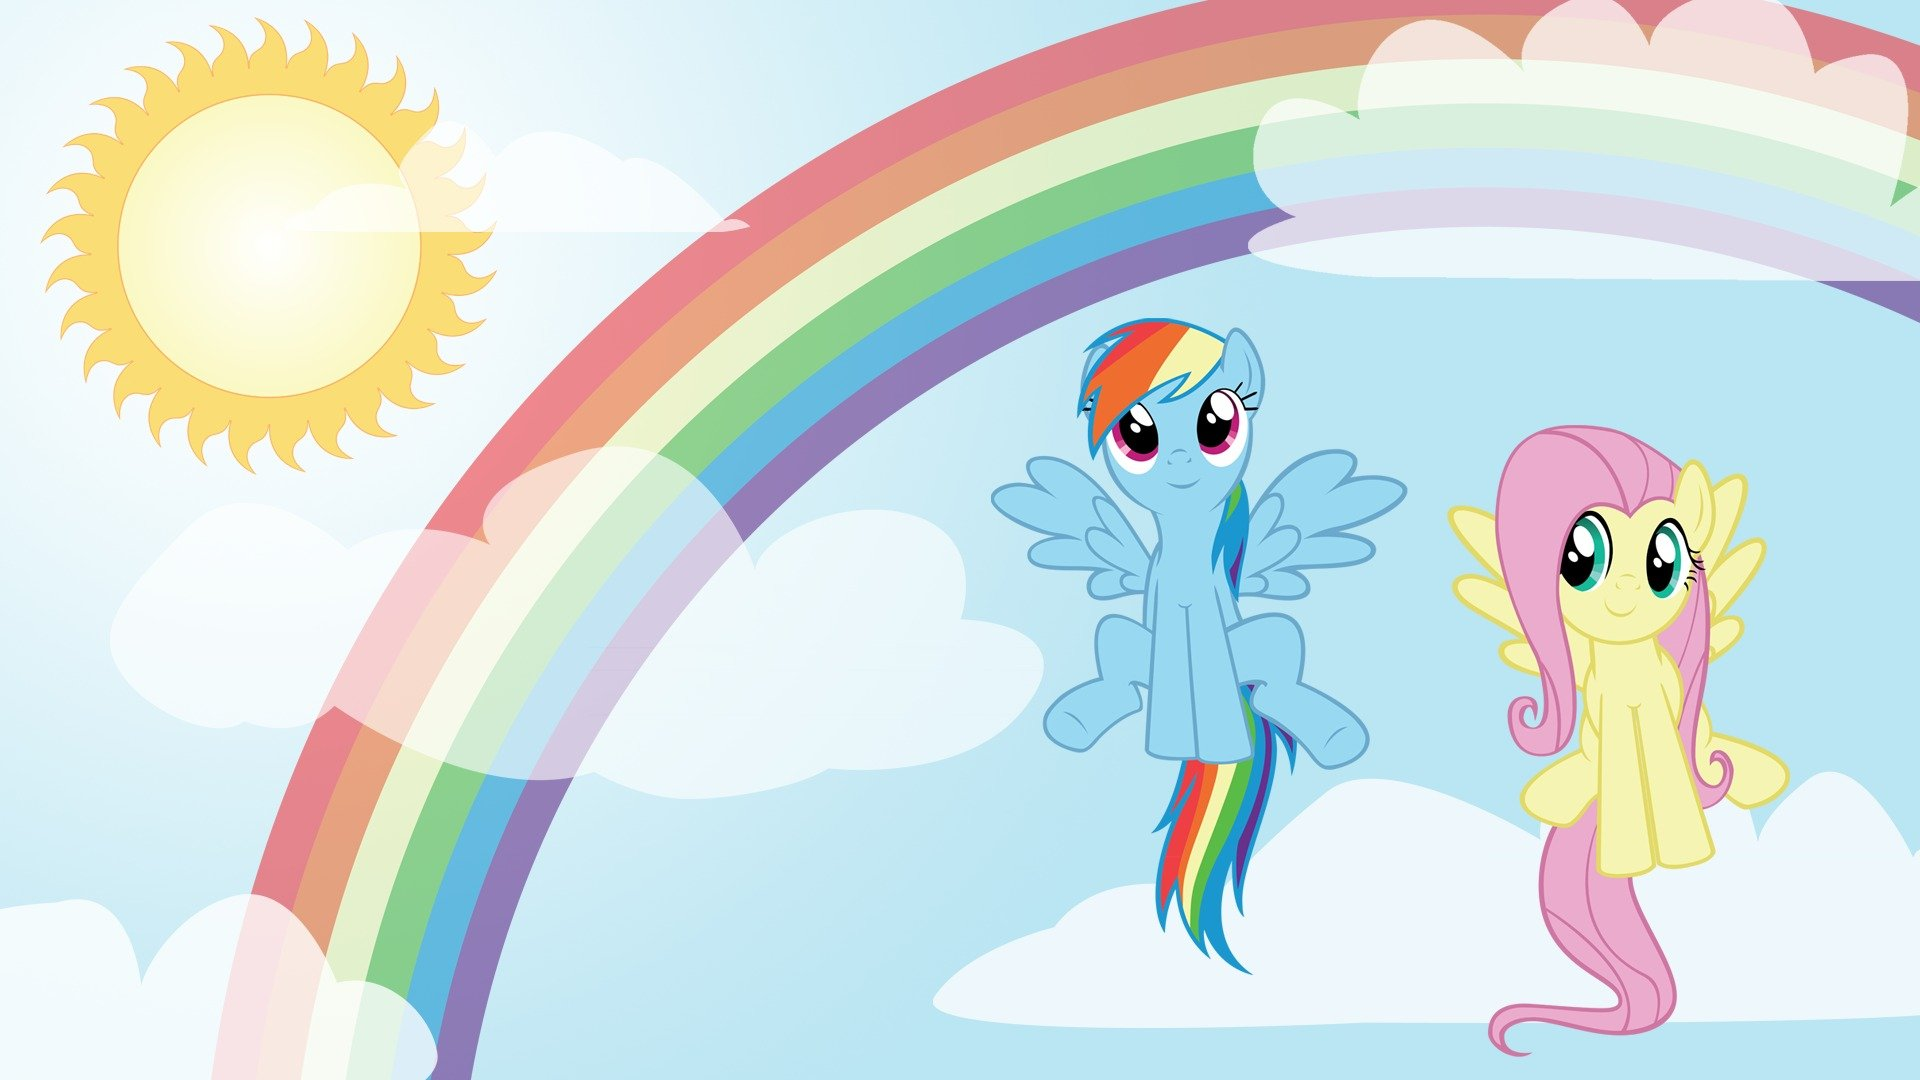 Im 52 My Little Pony Rainbow Dash Wallpaper 2880x1800